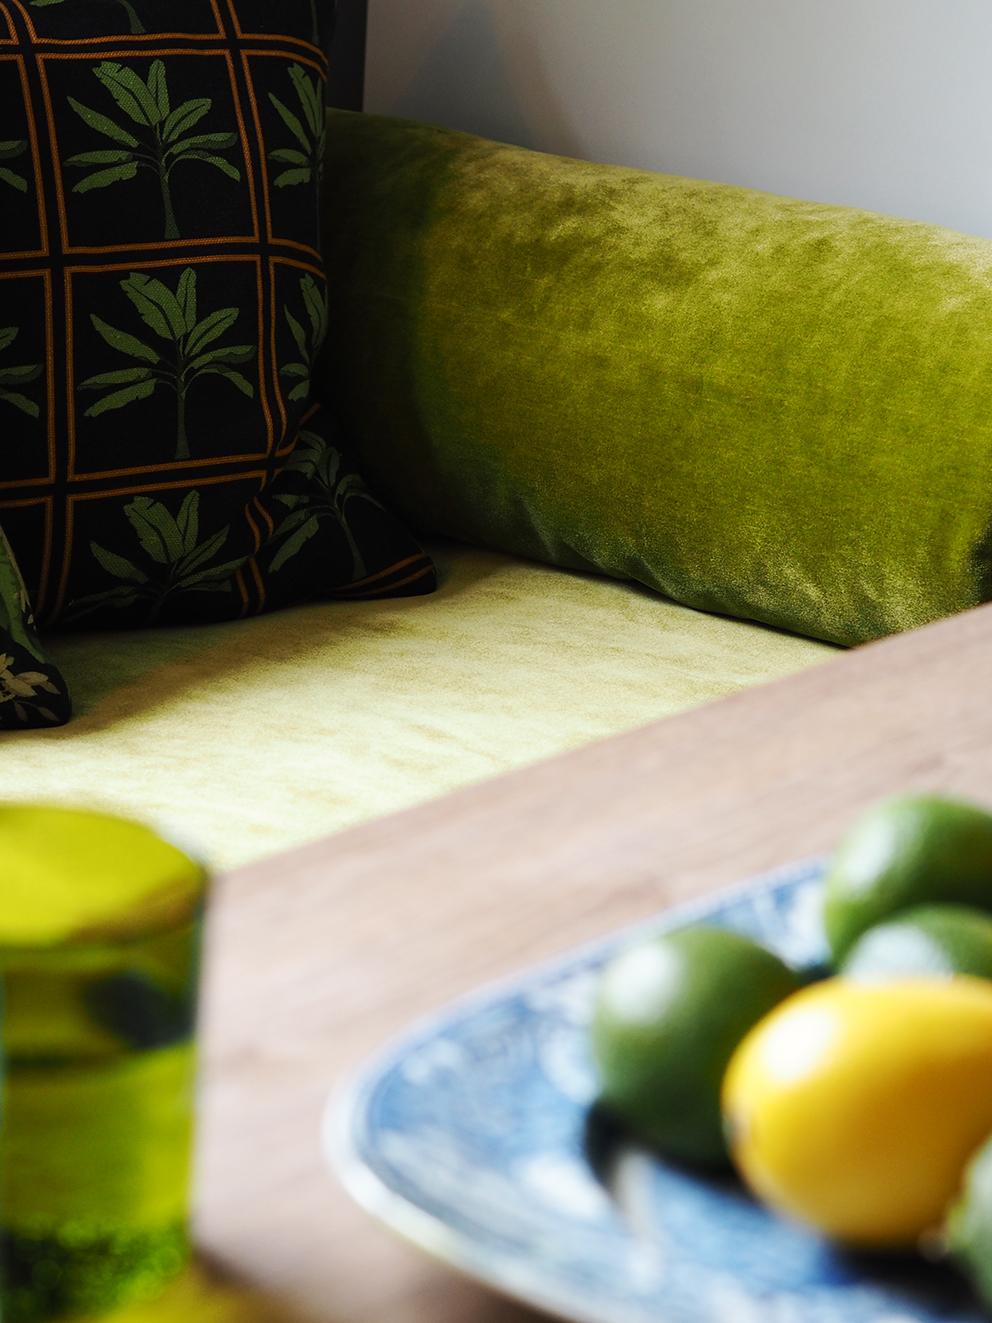 French For Pineapple - Velvet Fever In The Kitchen With Swaffer